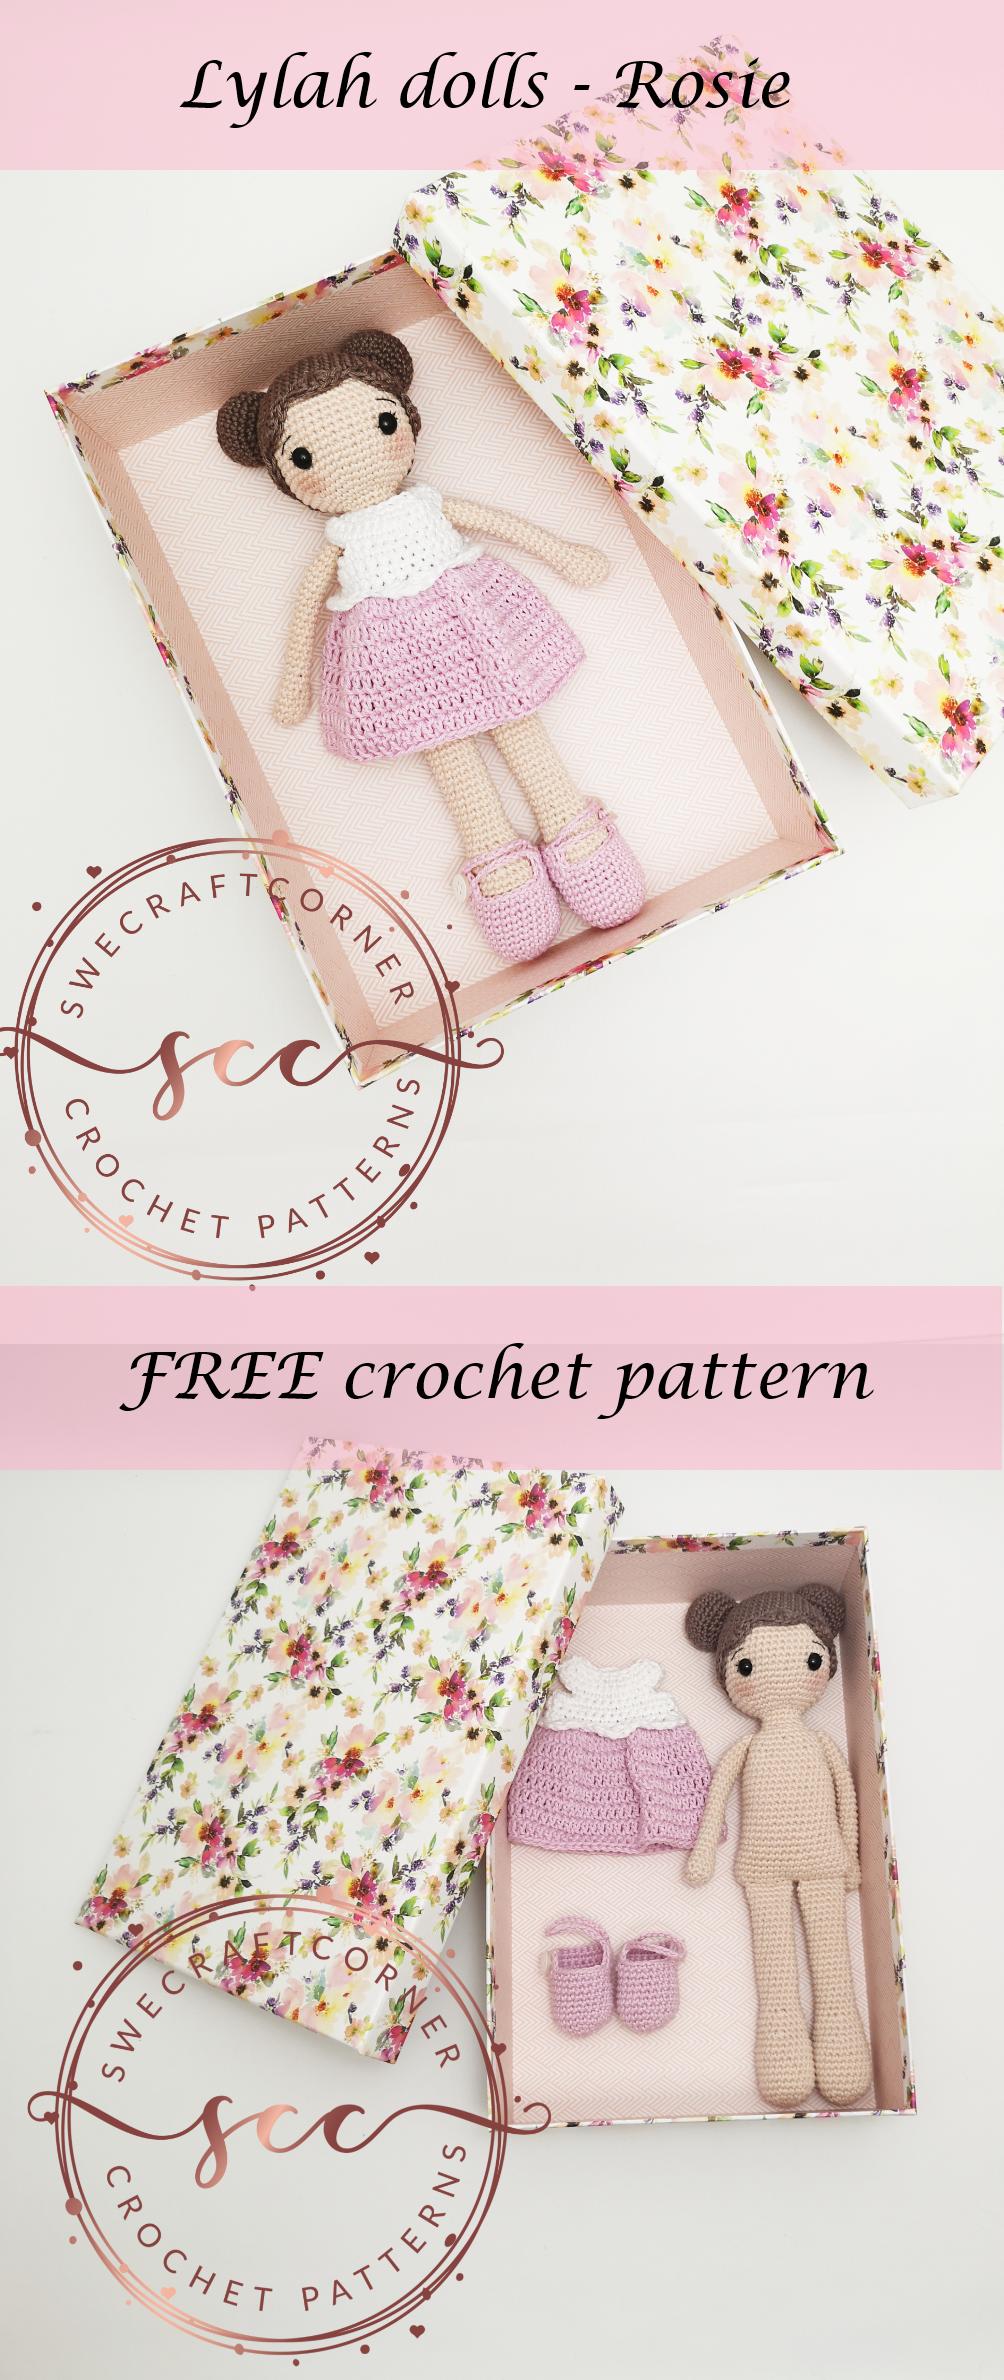 Lylah doll – Rosie FREE pattern – Swecraftcorner Free crochet pattern Crochet doll pattern #crochetdolls